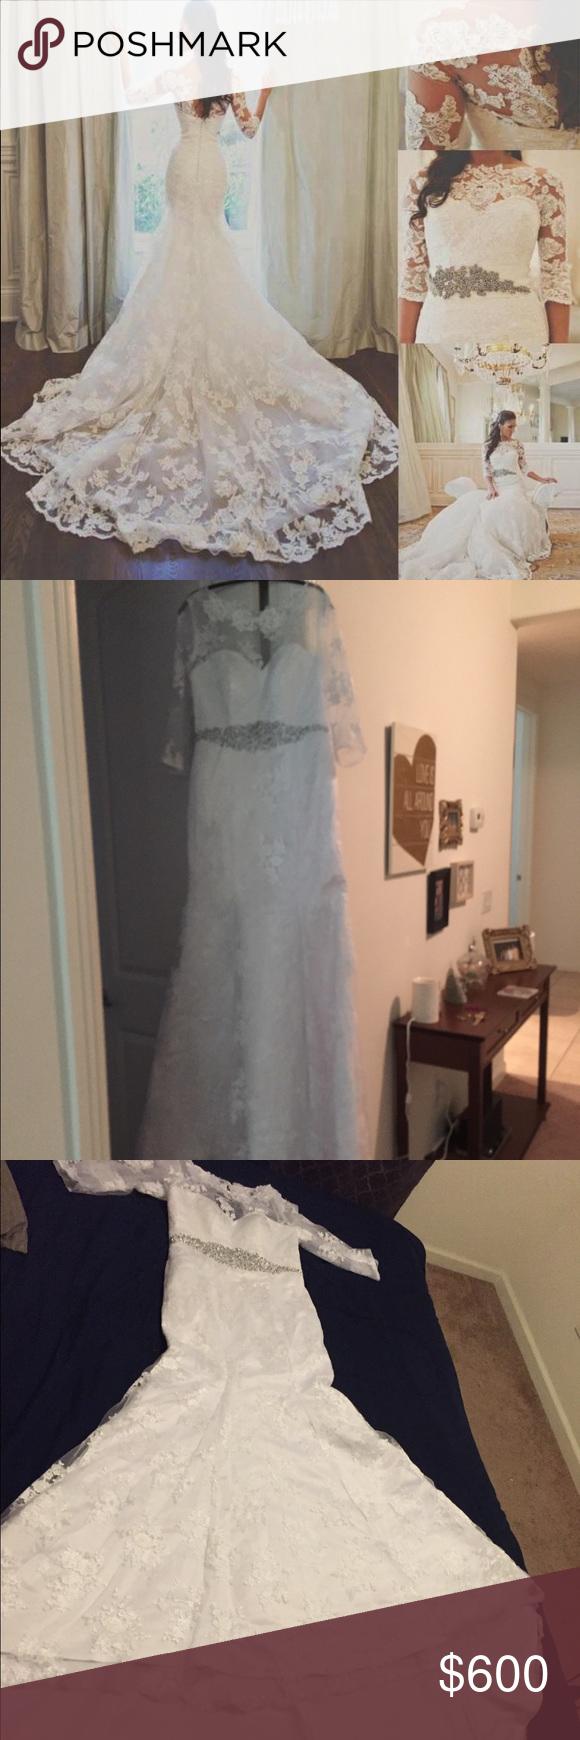 Wedding Dress New Wedding Dresses Dresses New Dress